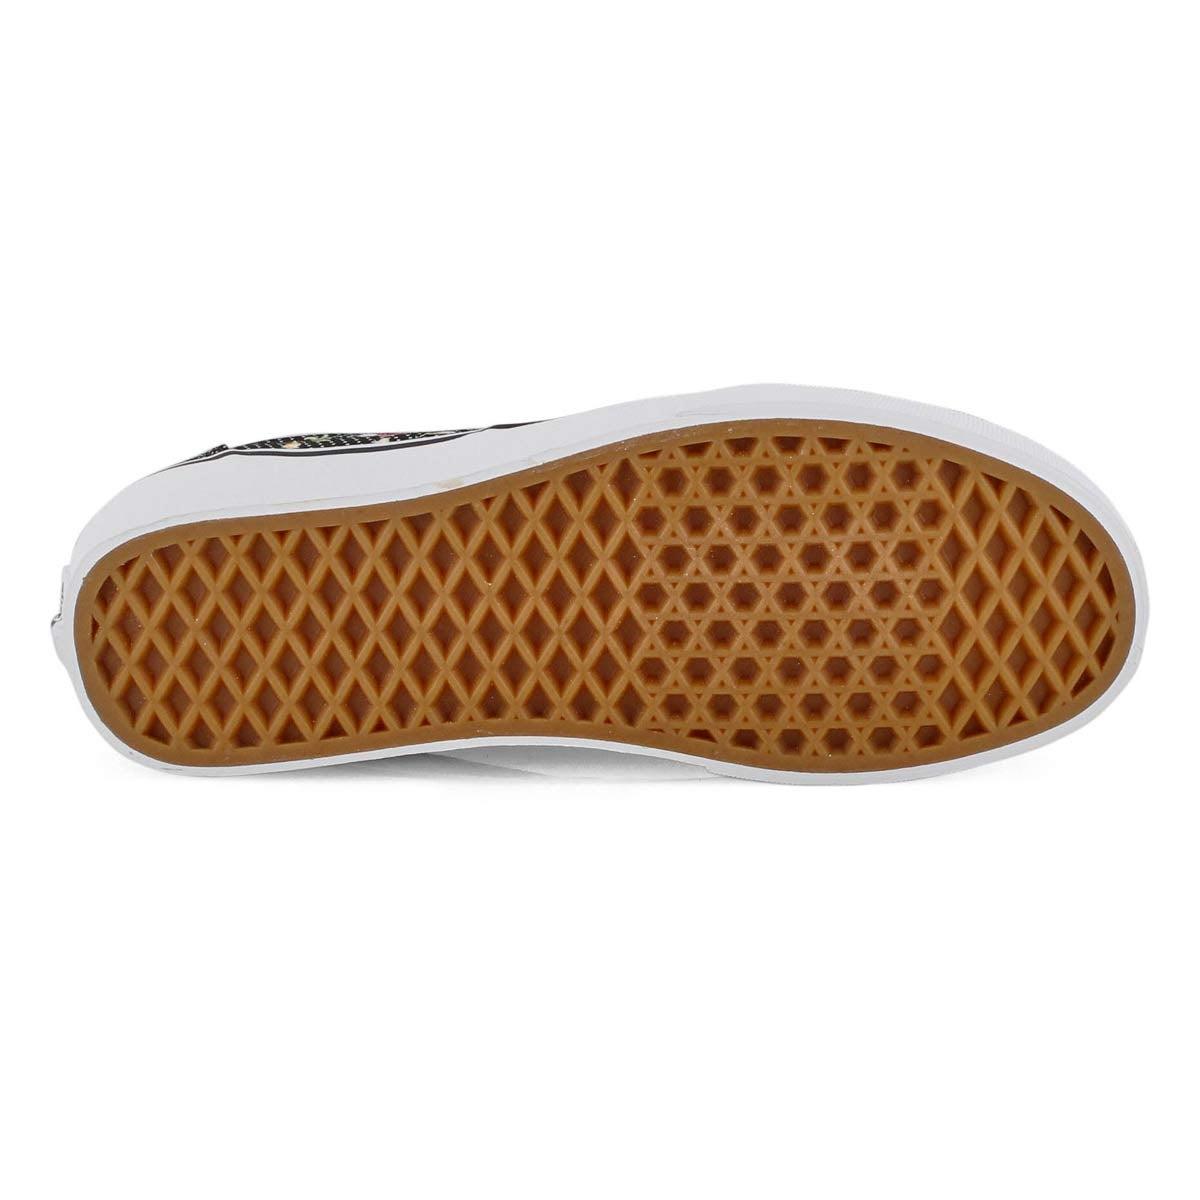 Women's Doheny Sneaker - Floral Dot Black/White